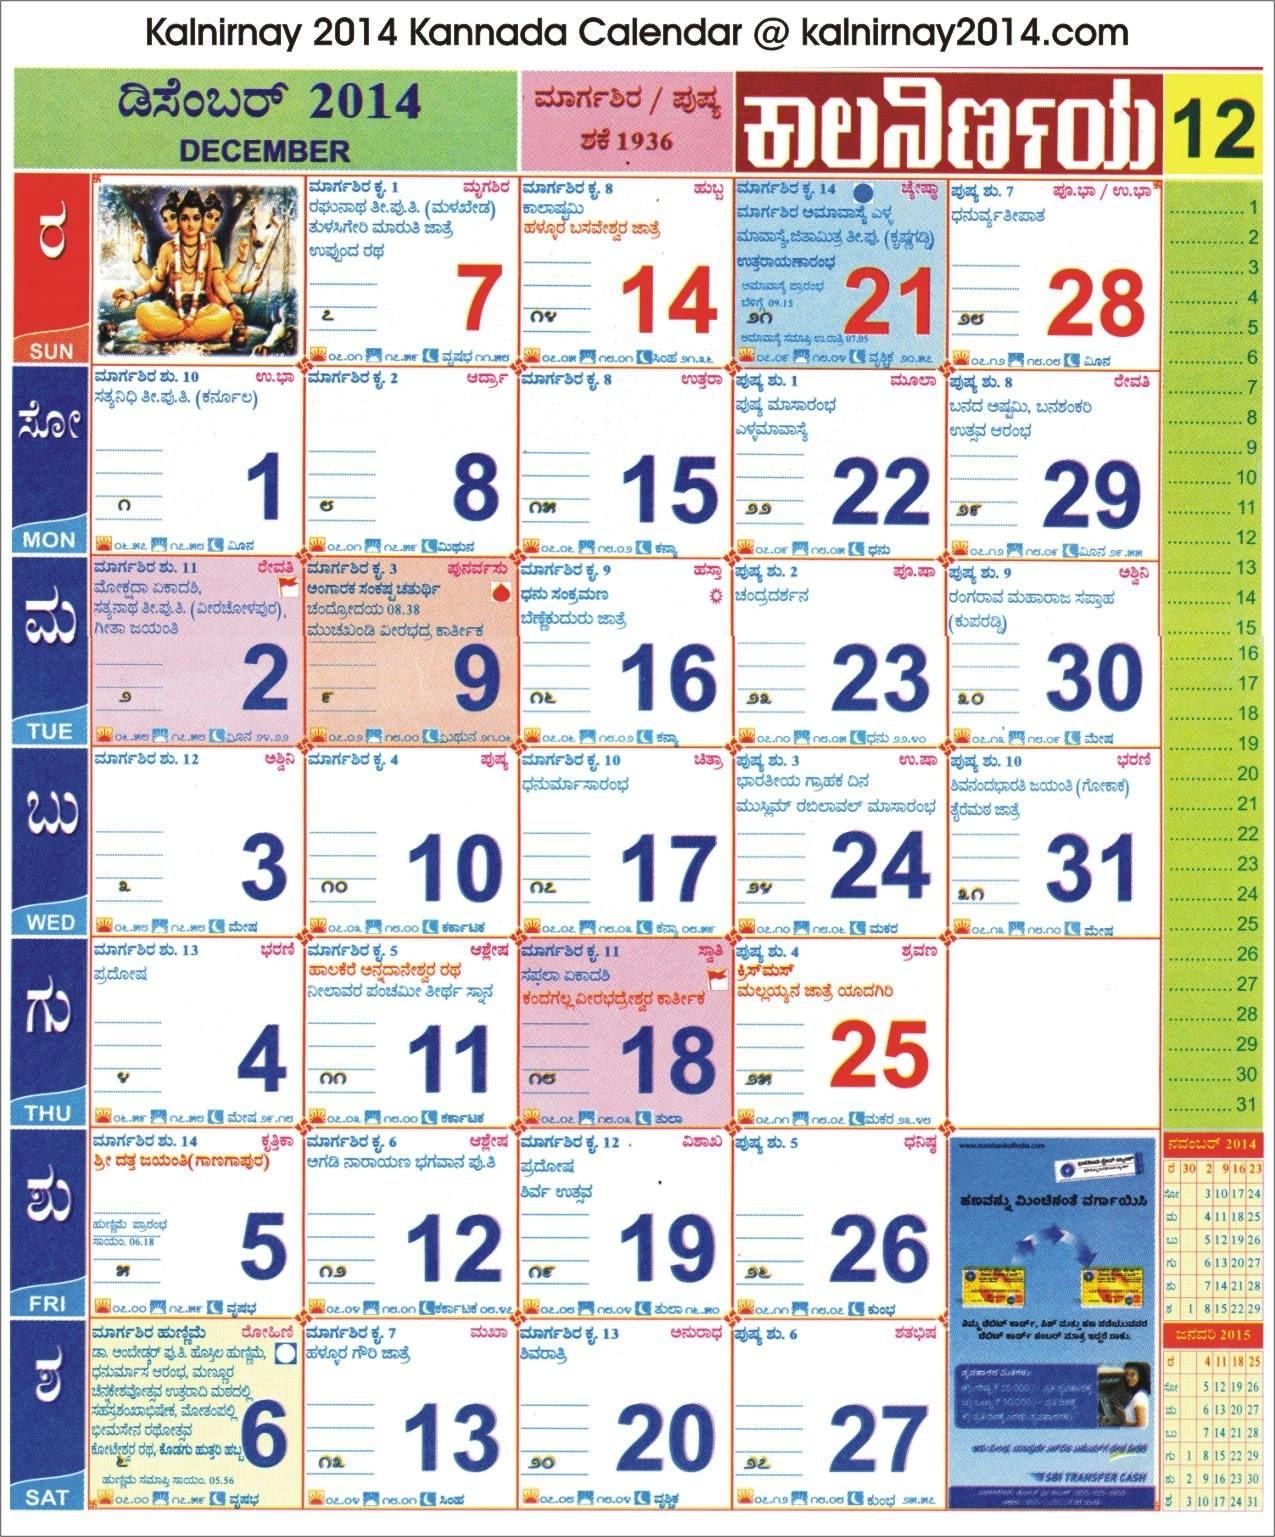 December 2014 Kannada Kalnirnay Calendar | 2014 Kannada Kalnirnay Calendar 2019 Kannada Pdf